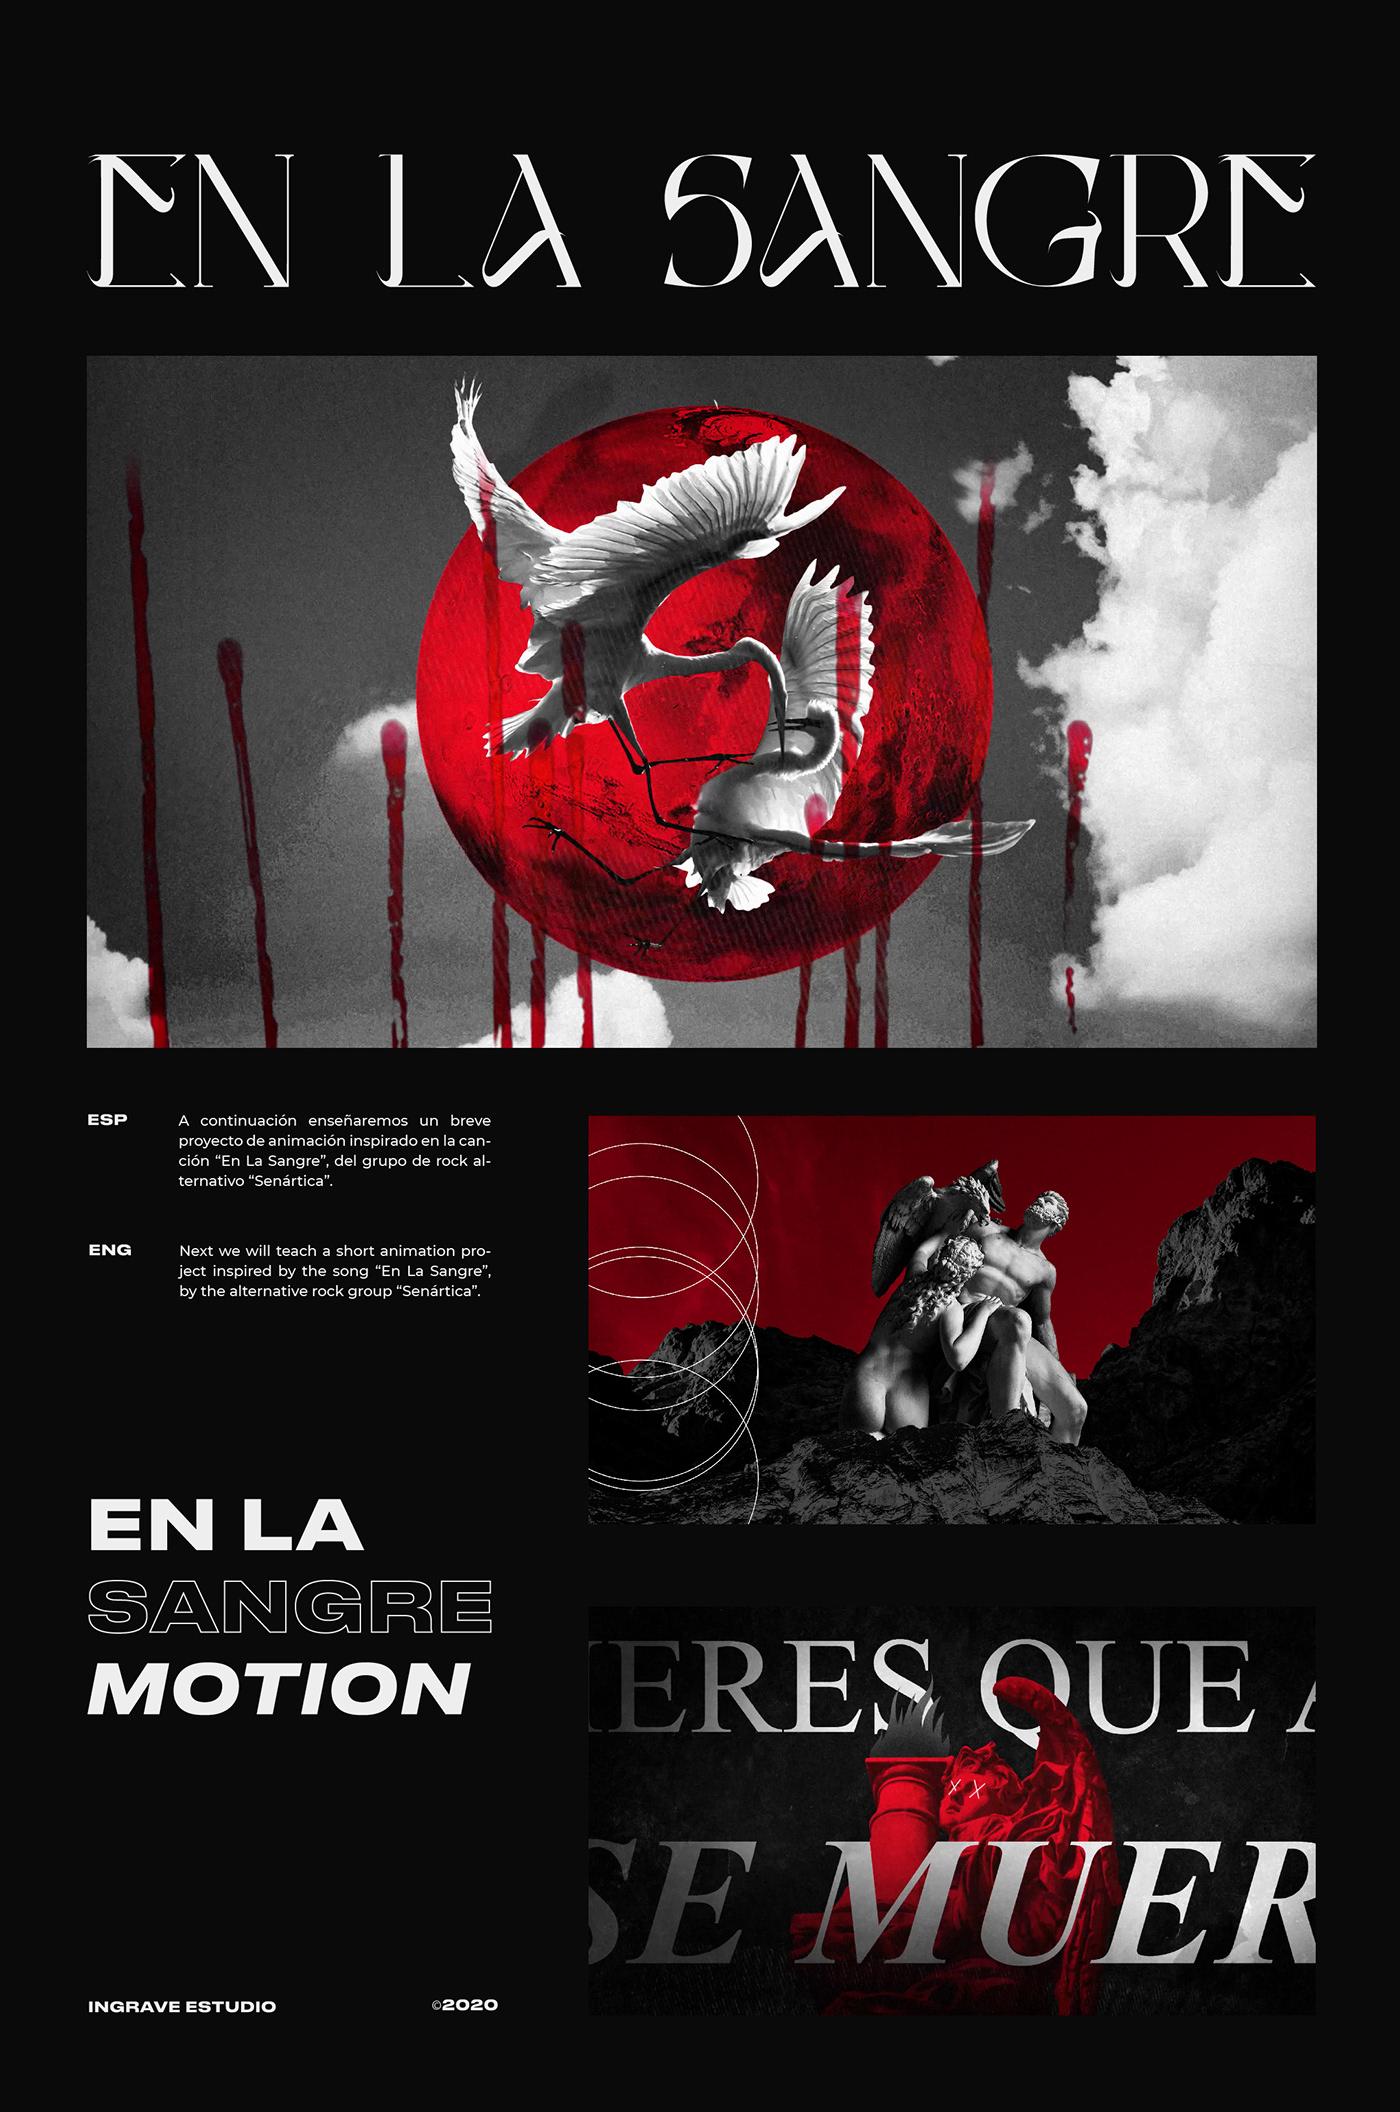 animacion animation  graphic design  motion graphics  video lyric Videoclip